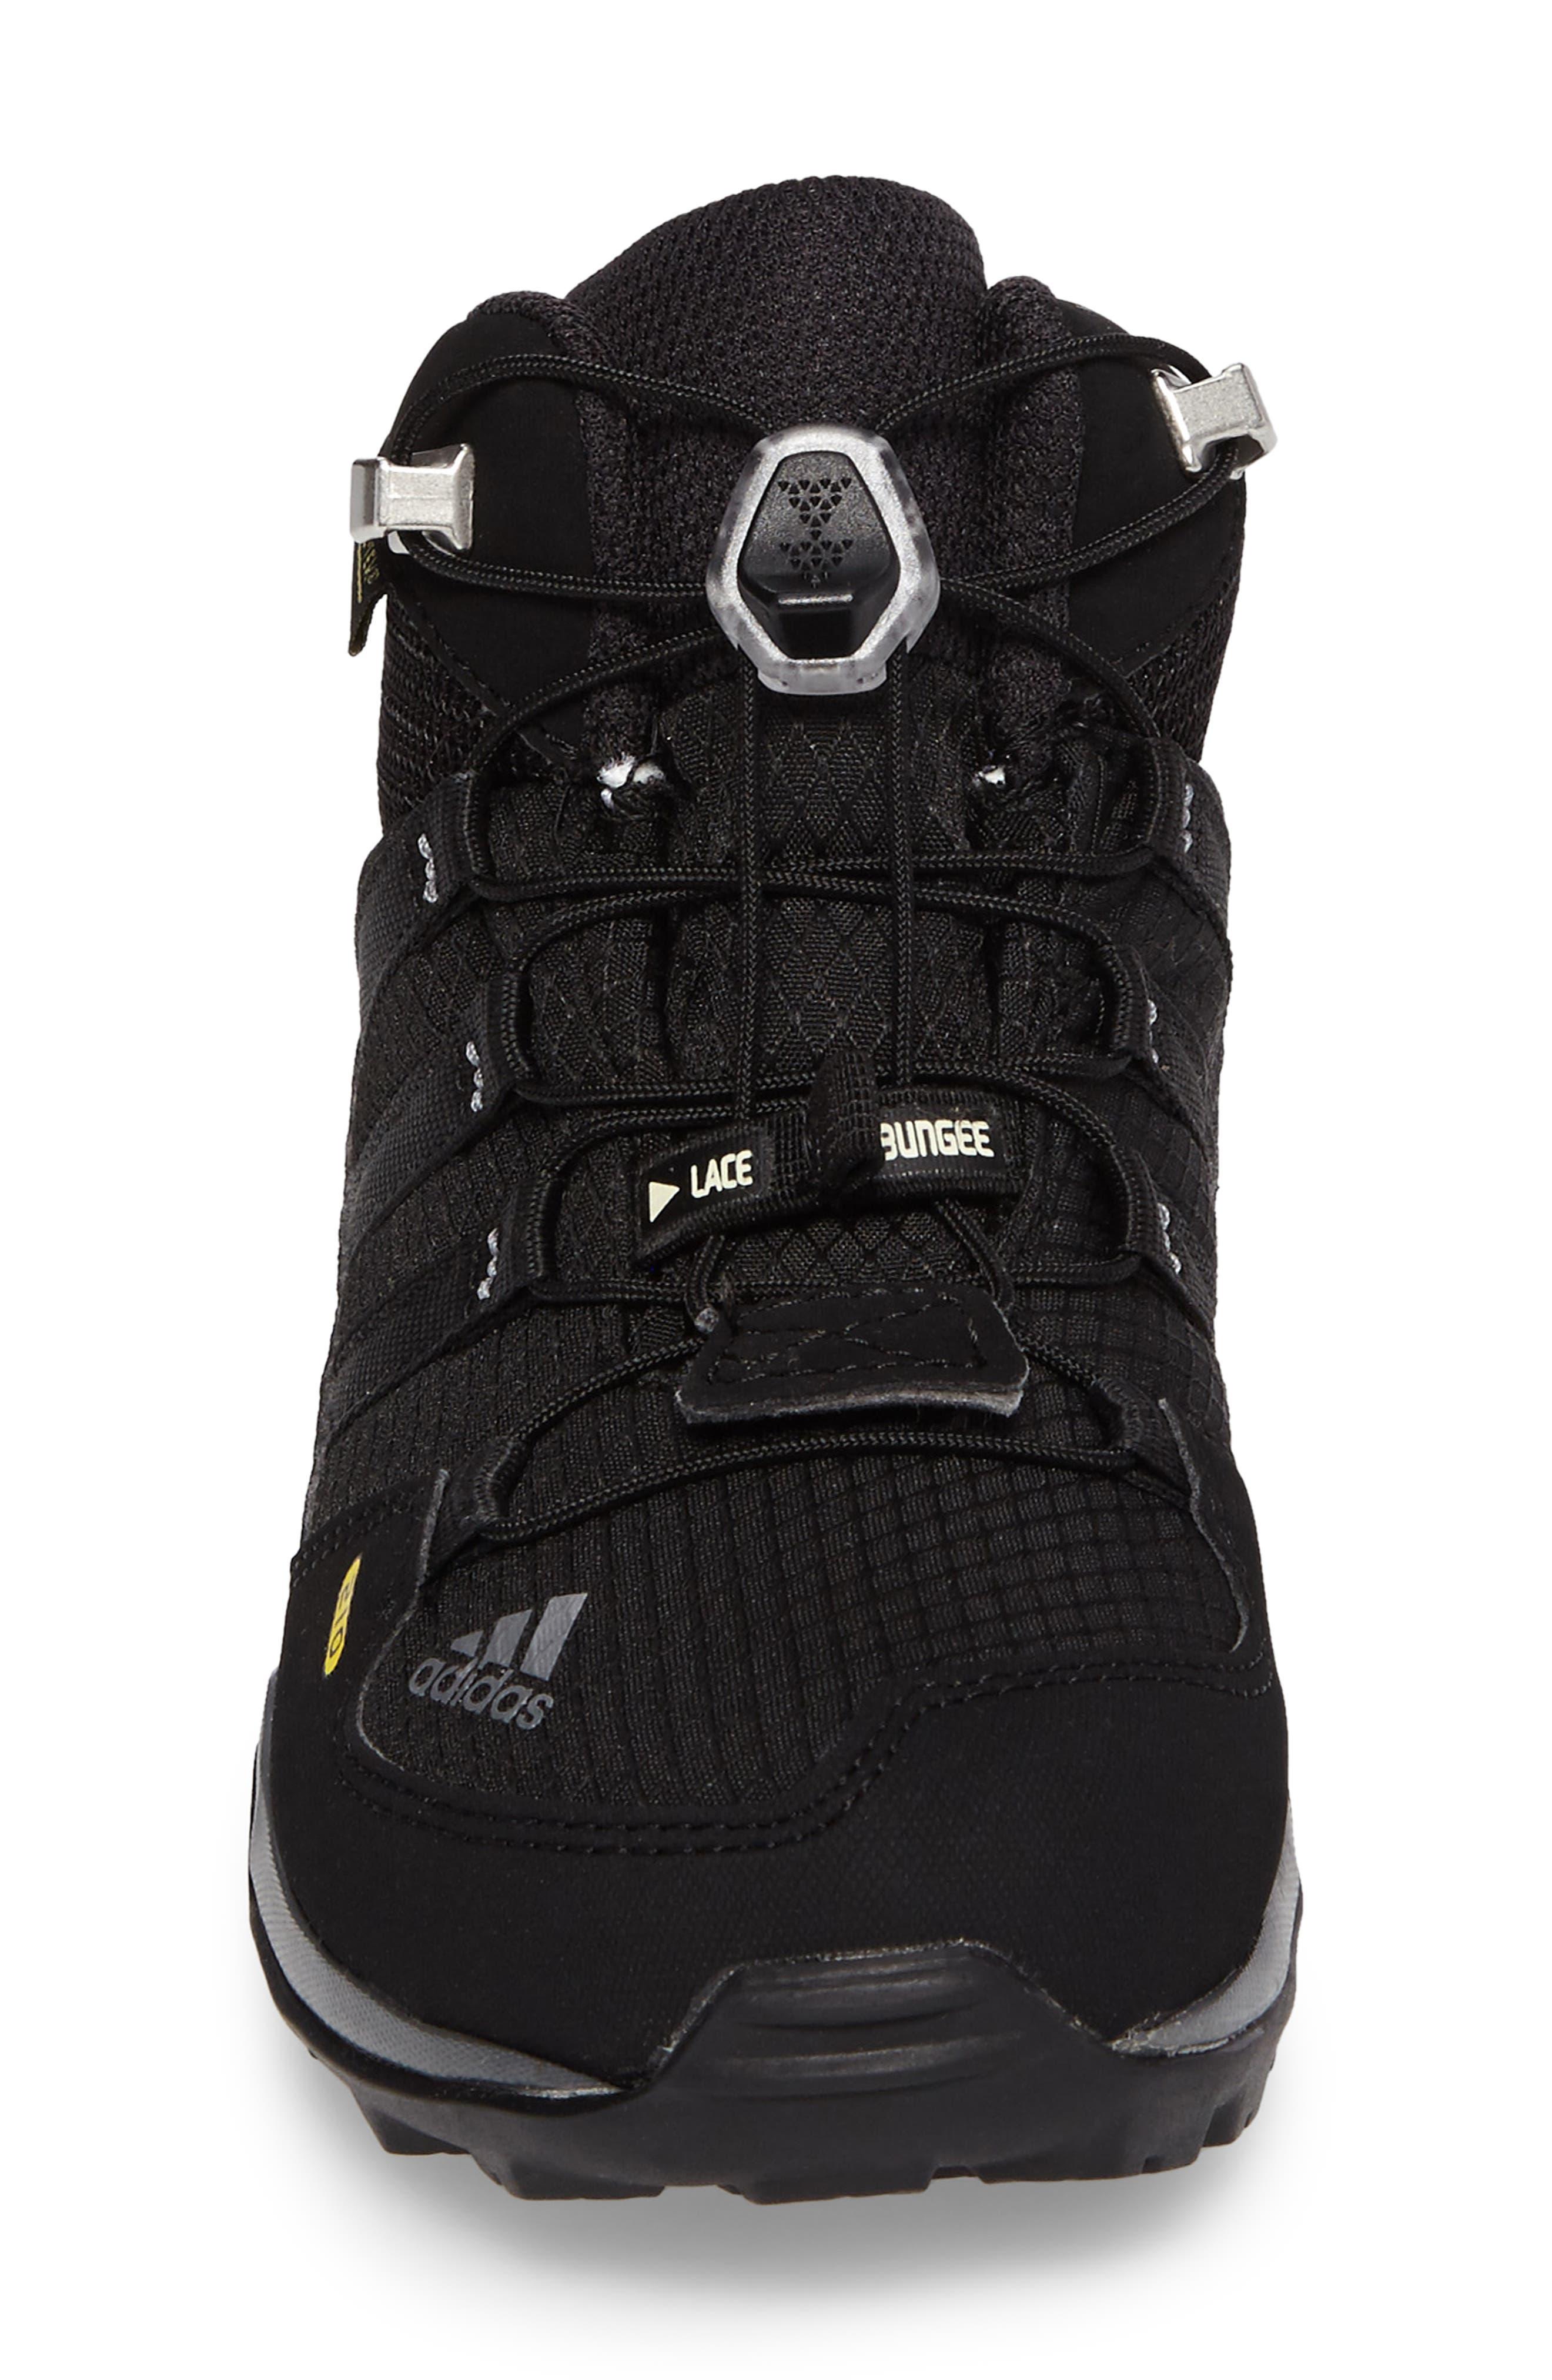 Terrex Mid Gore-Tex<sup>®</sup> Insulated Waterproof Sneaker Boot,                             Alternate thumbnail 4, color,                             Black/ Black/ Vista Grey